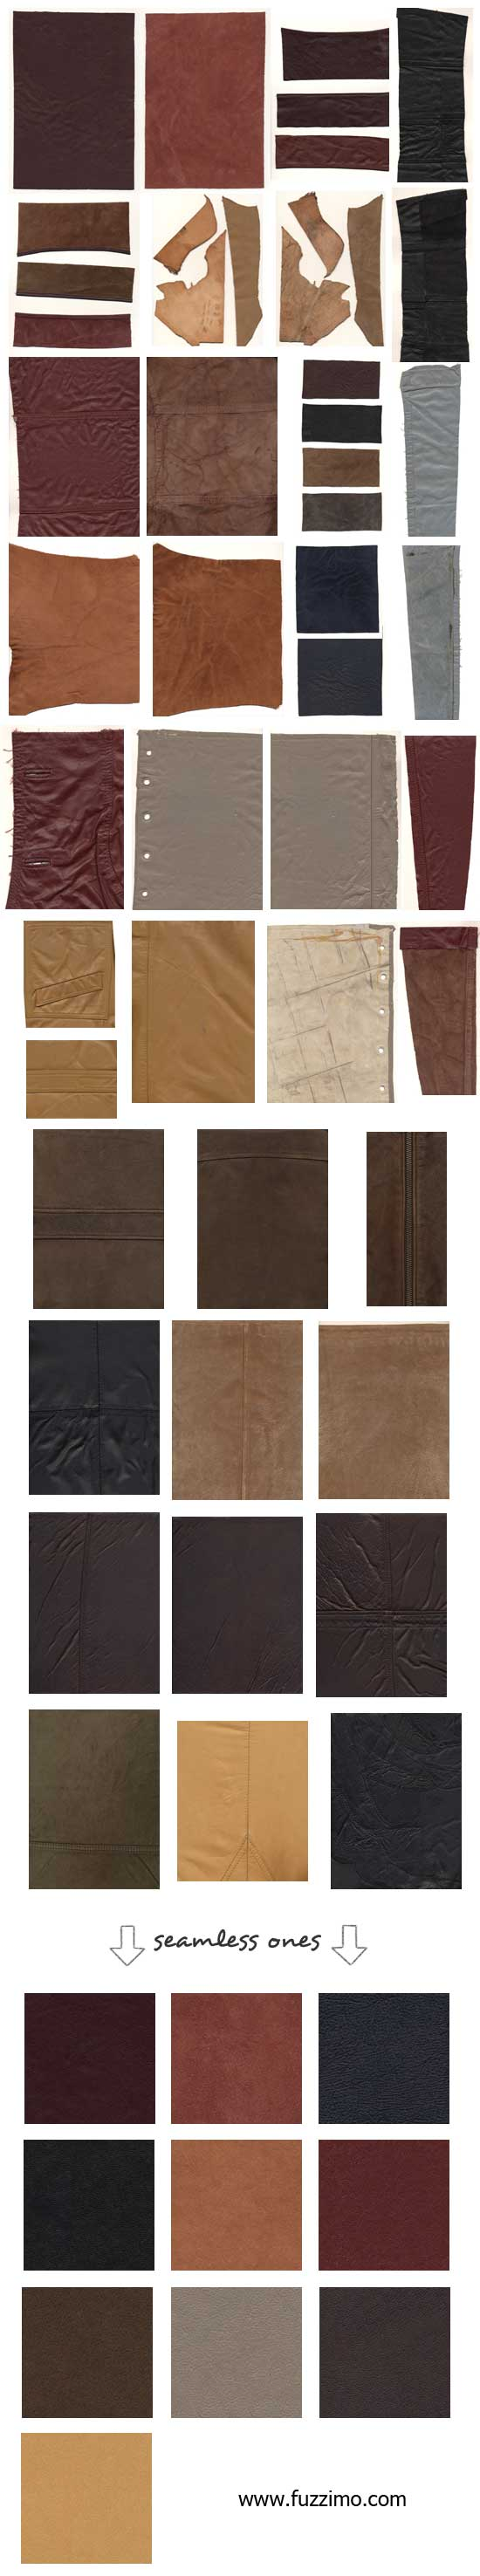 fzm-Leather Textures-03